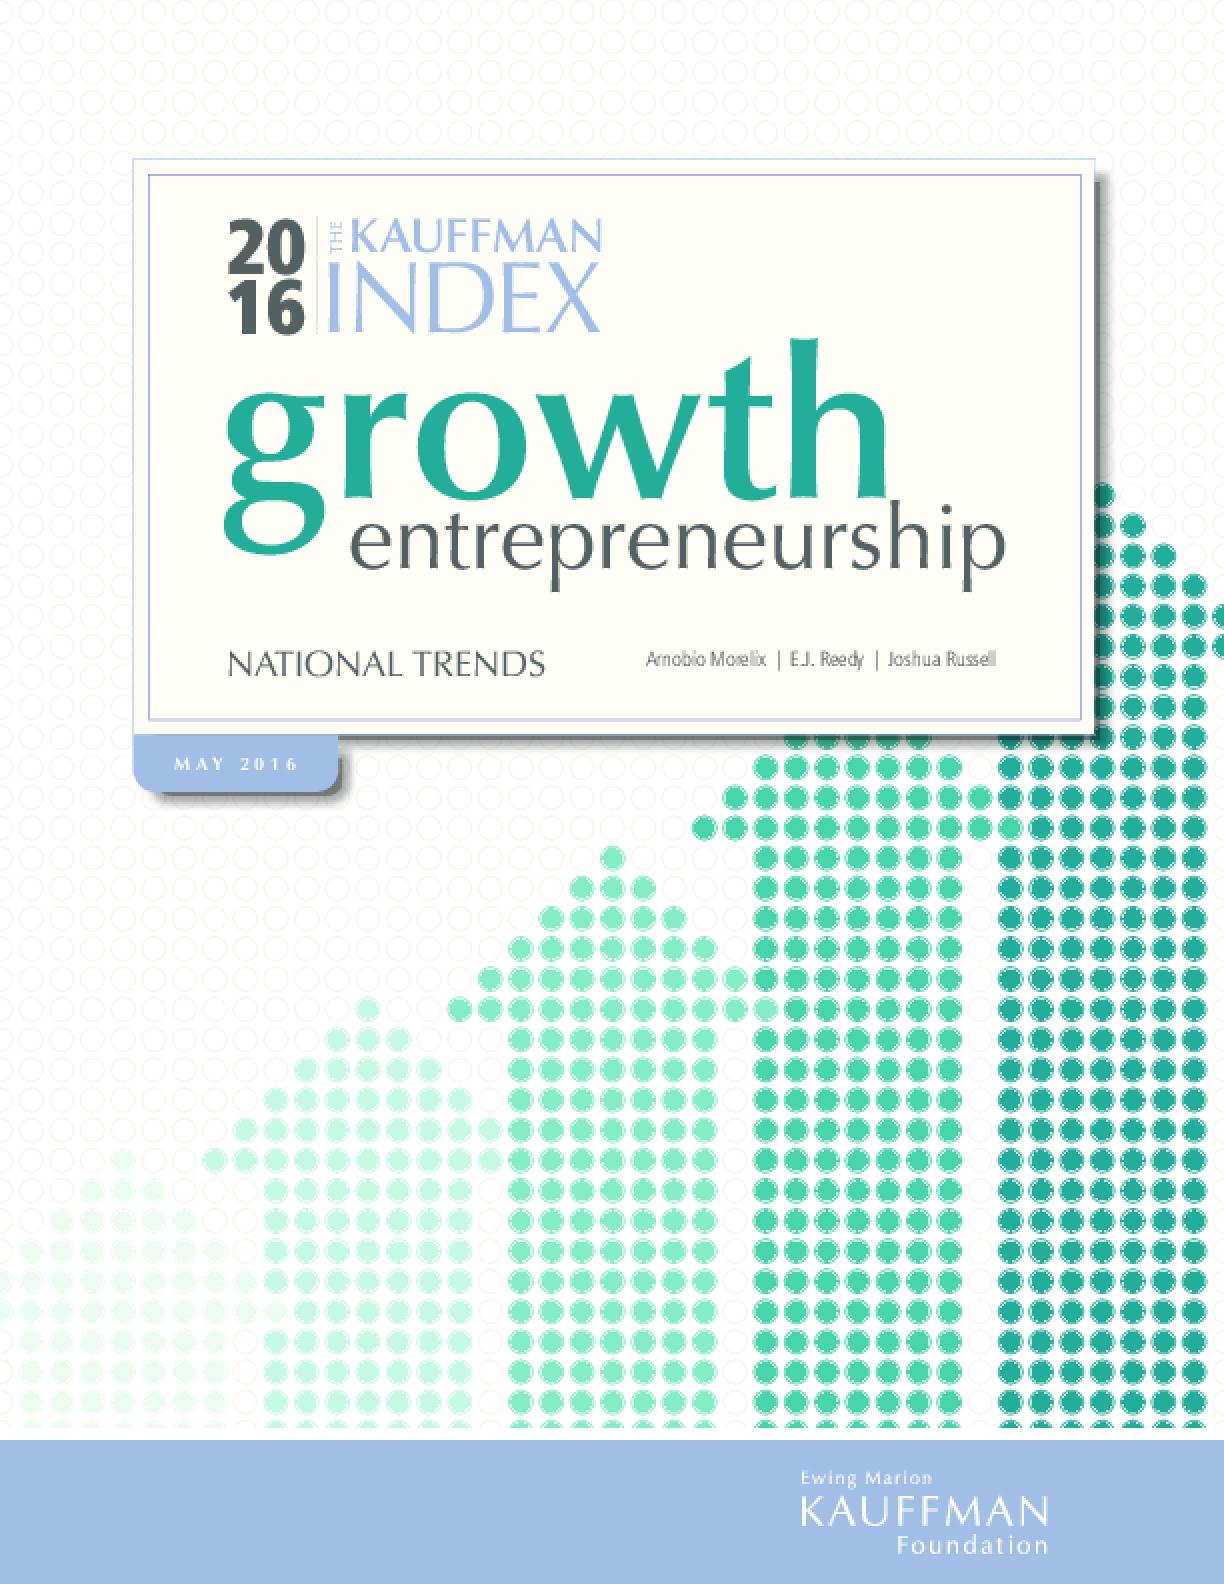 The Kauffman Index 2016: Growth Entrepreneurship - National Trends